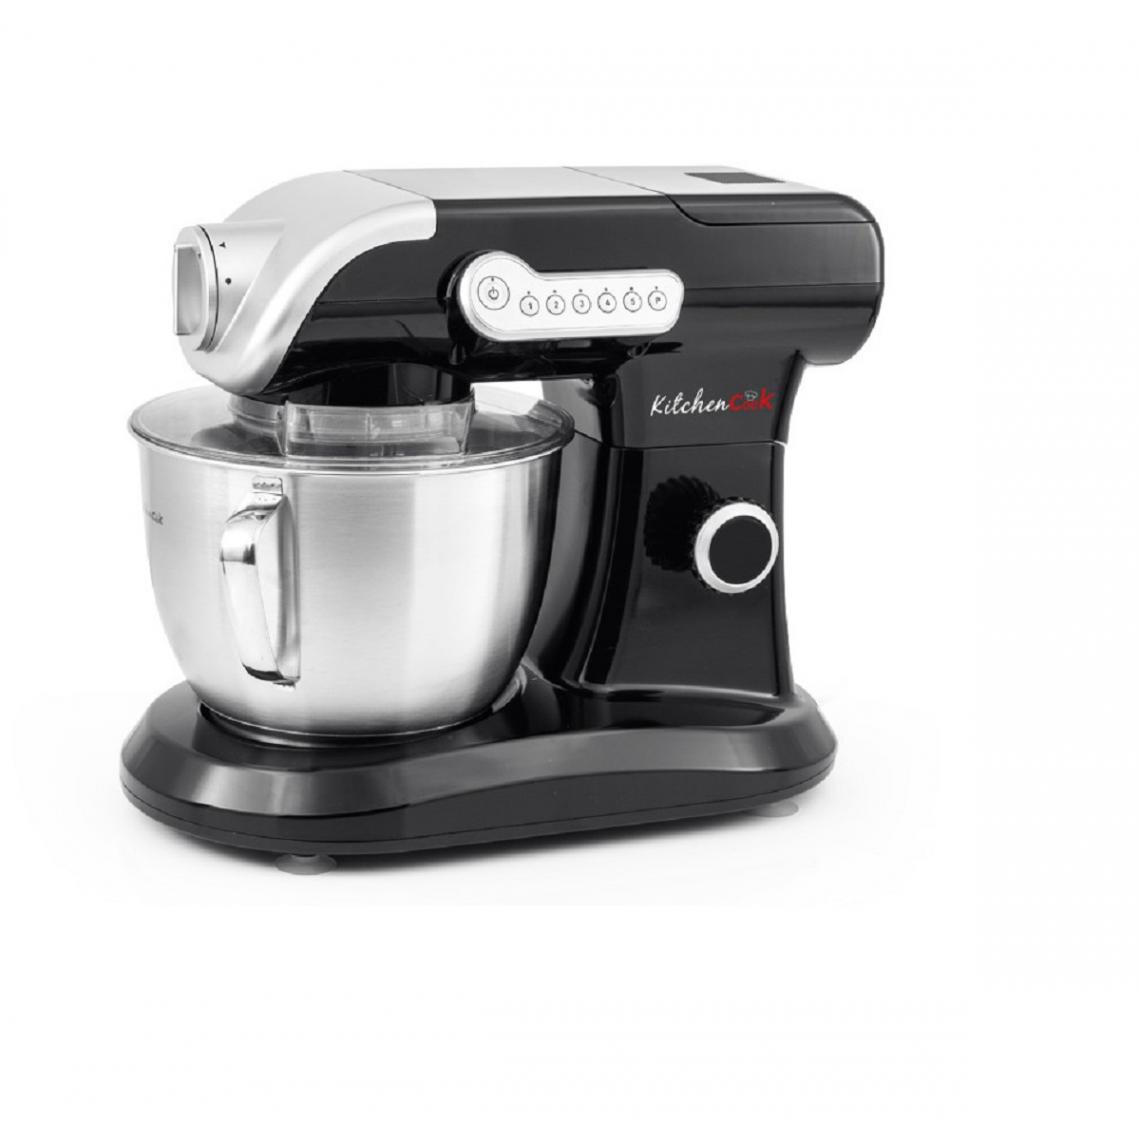 Kitchencook Robot pétrin multifonction Evolution - 1000W - Noir